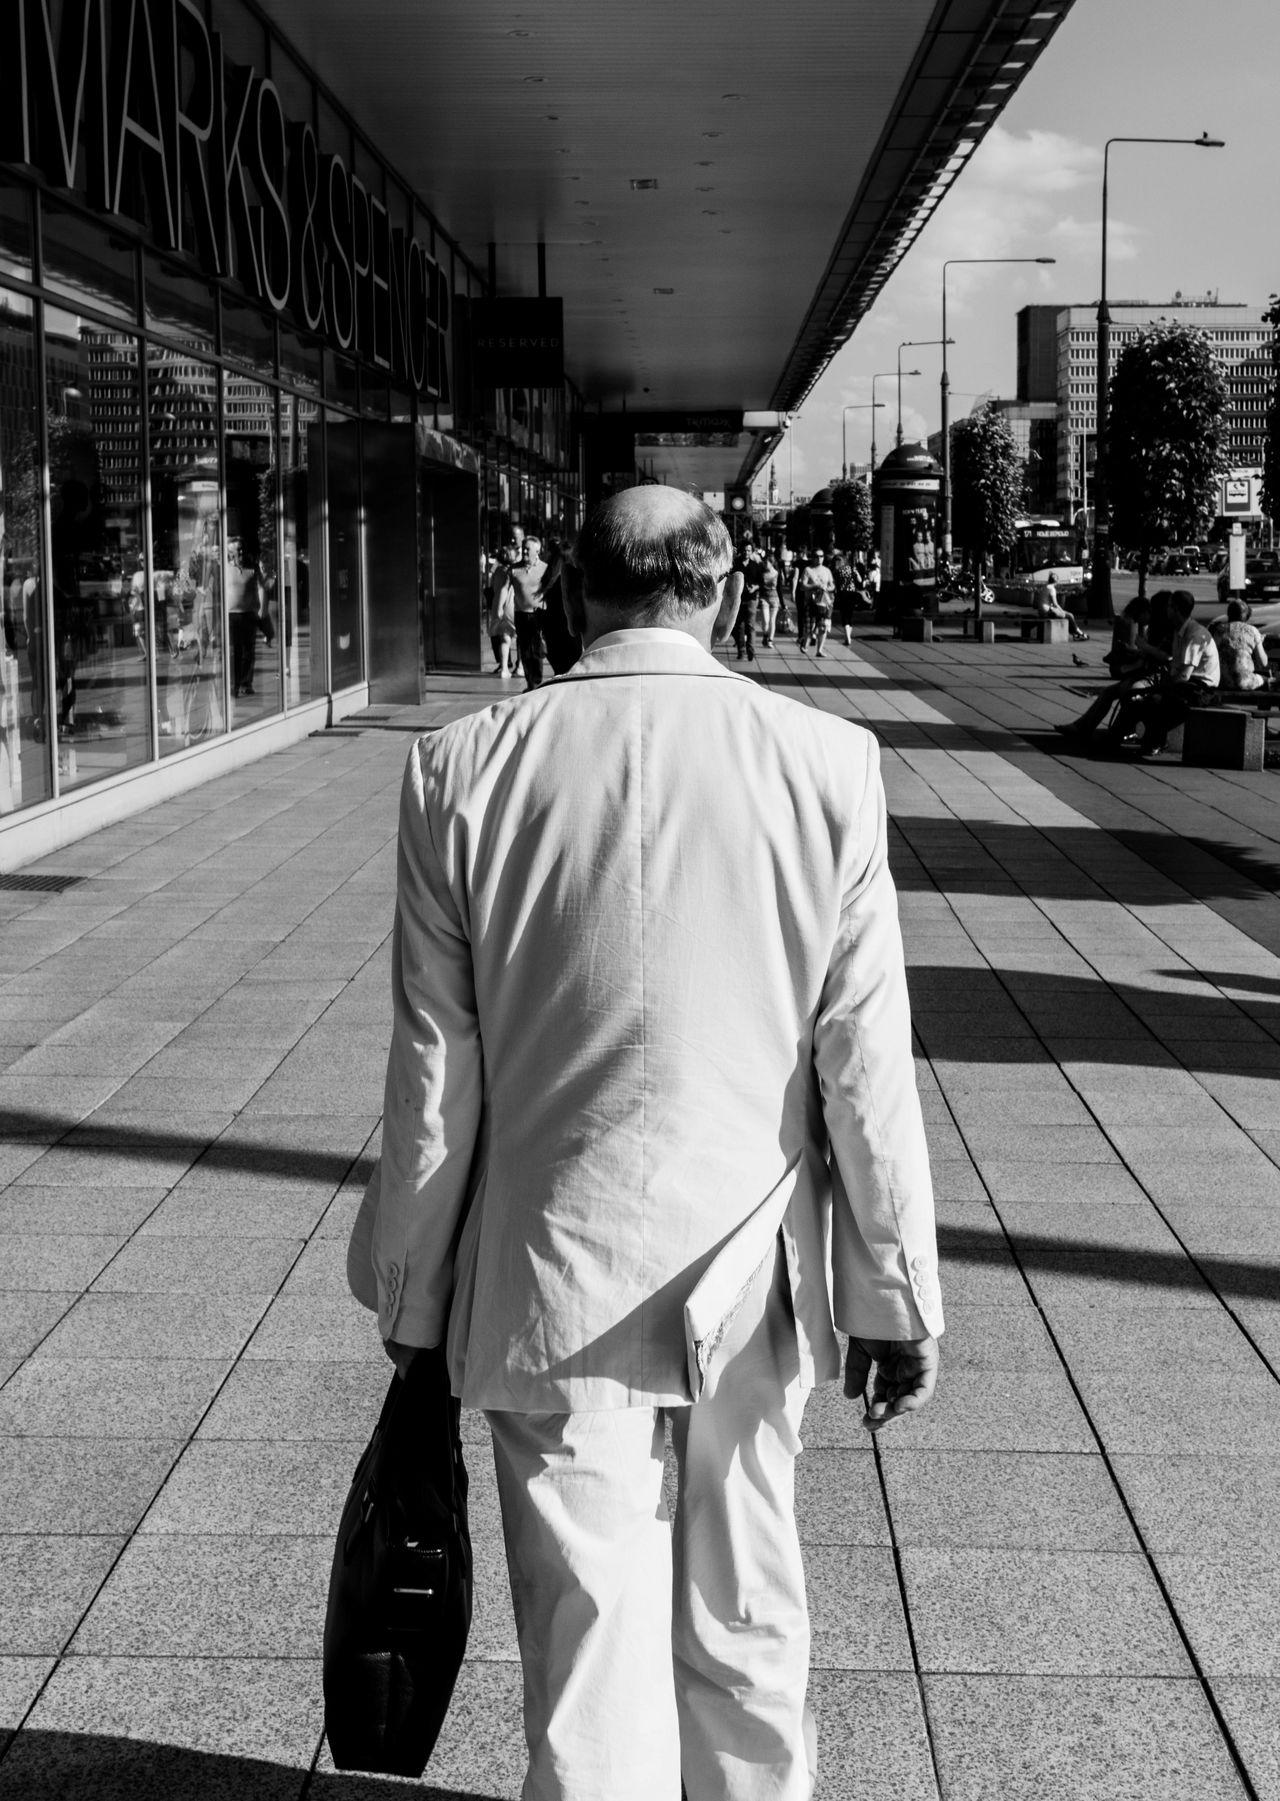 Beautiful stock photos of senior, rear view, street, city, incidental people